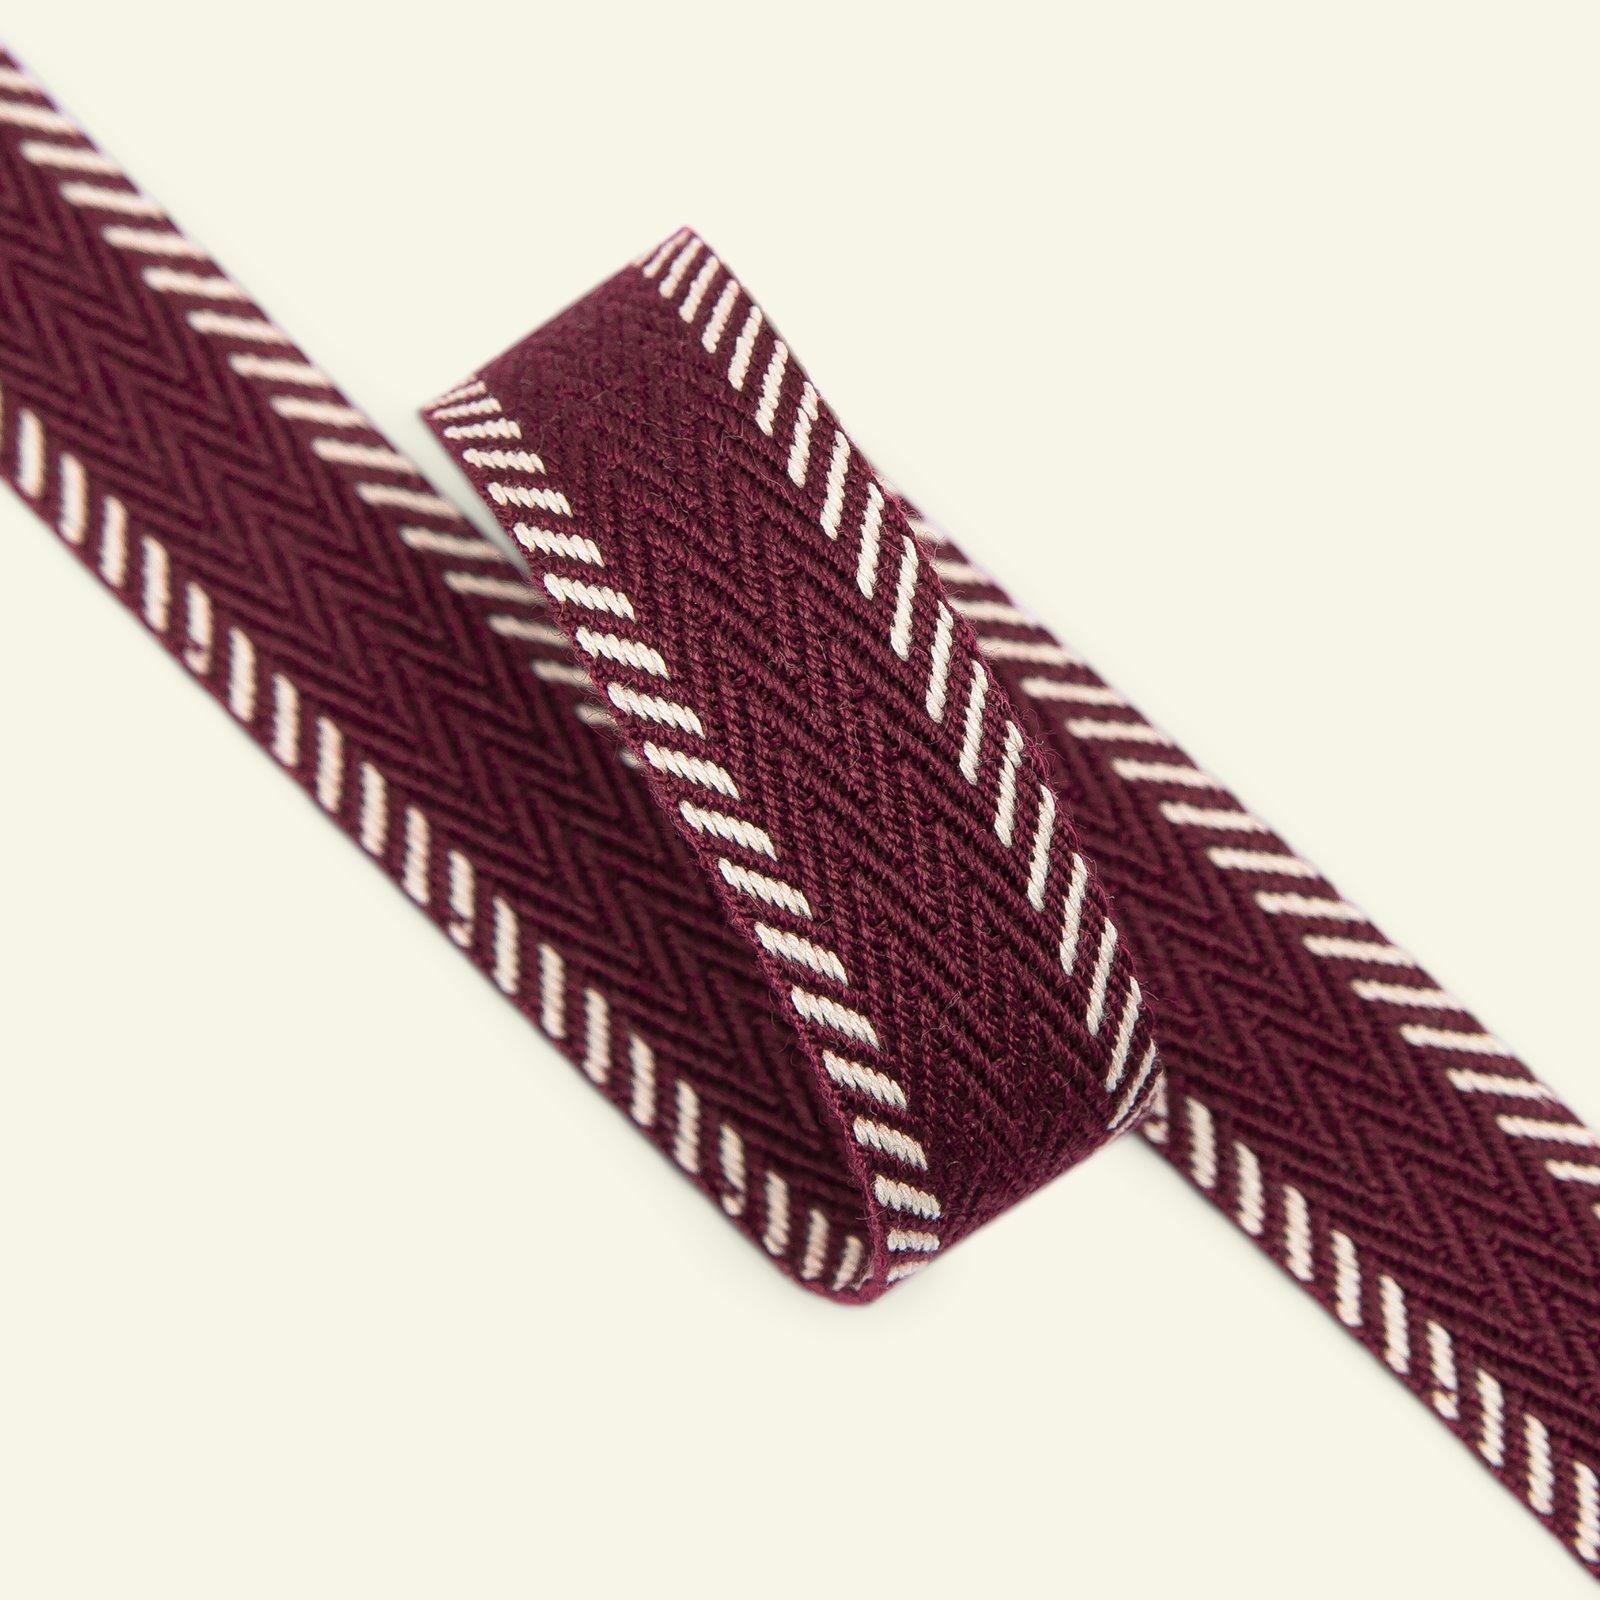 Gurtband 20mm Rot, 2m 22224_pack